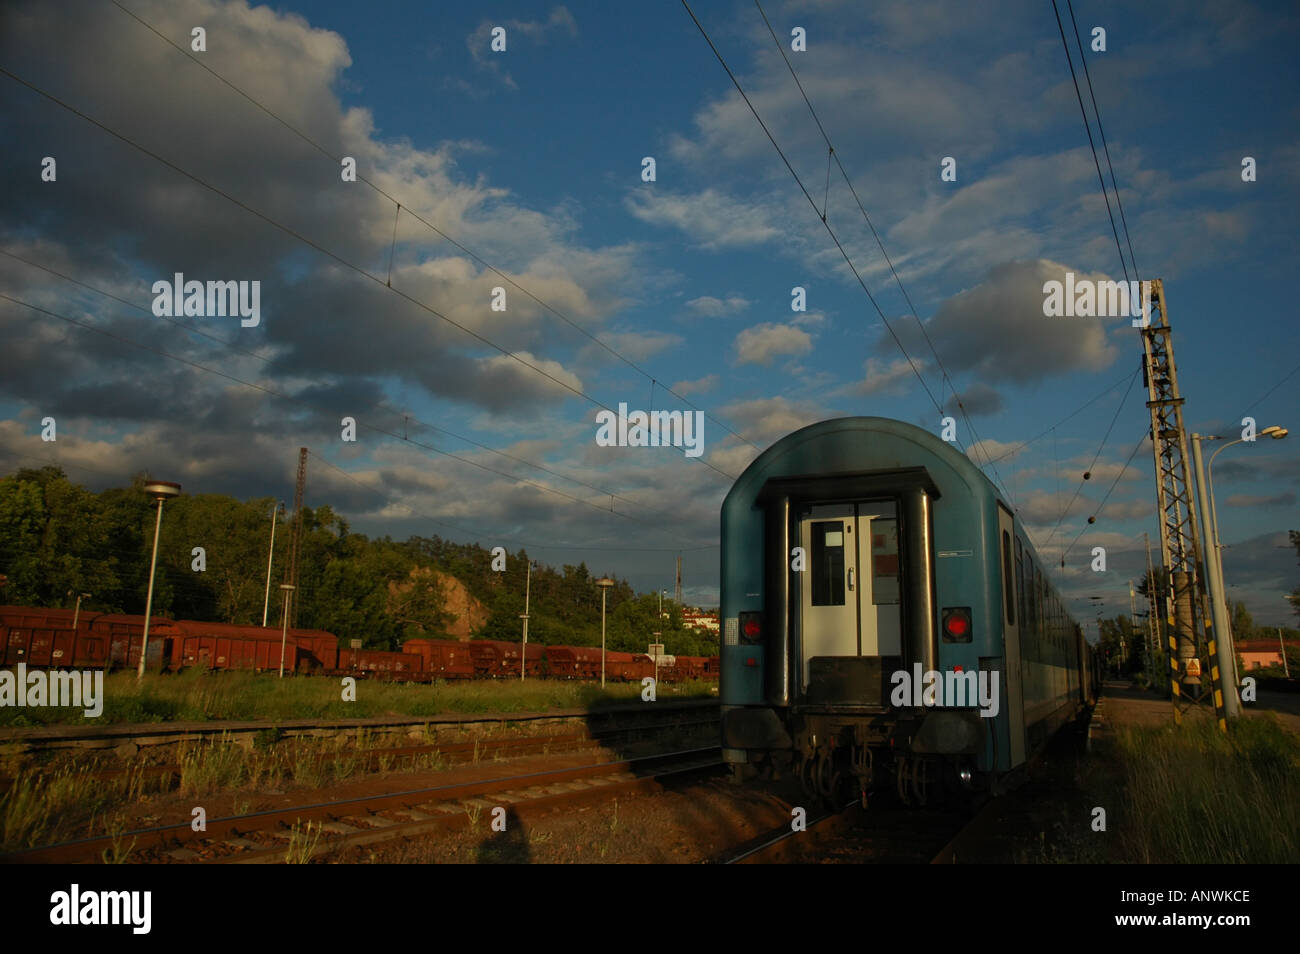 Eurocity Train Stock Photos & Eurocity Train Stock Images - Page 2